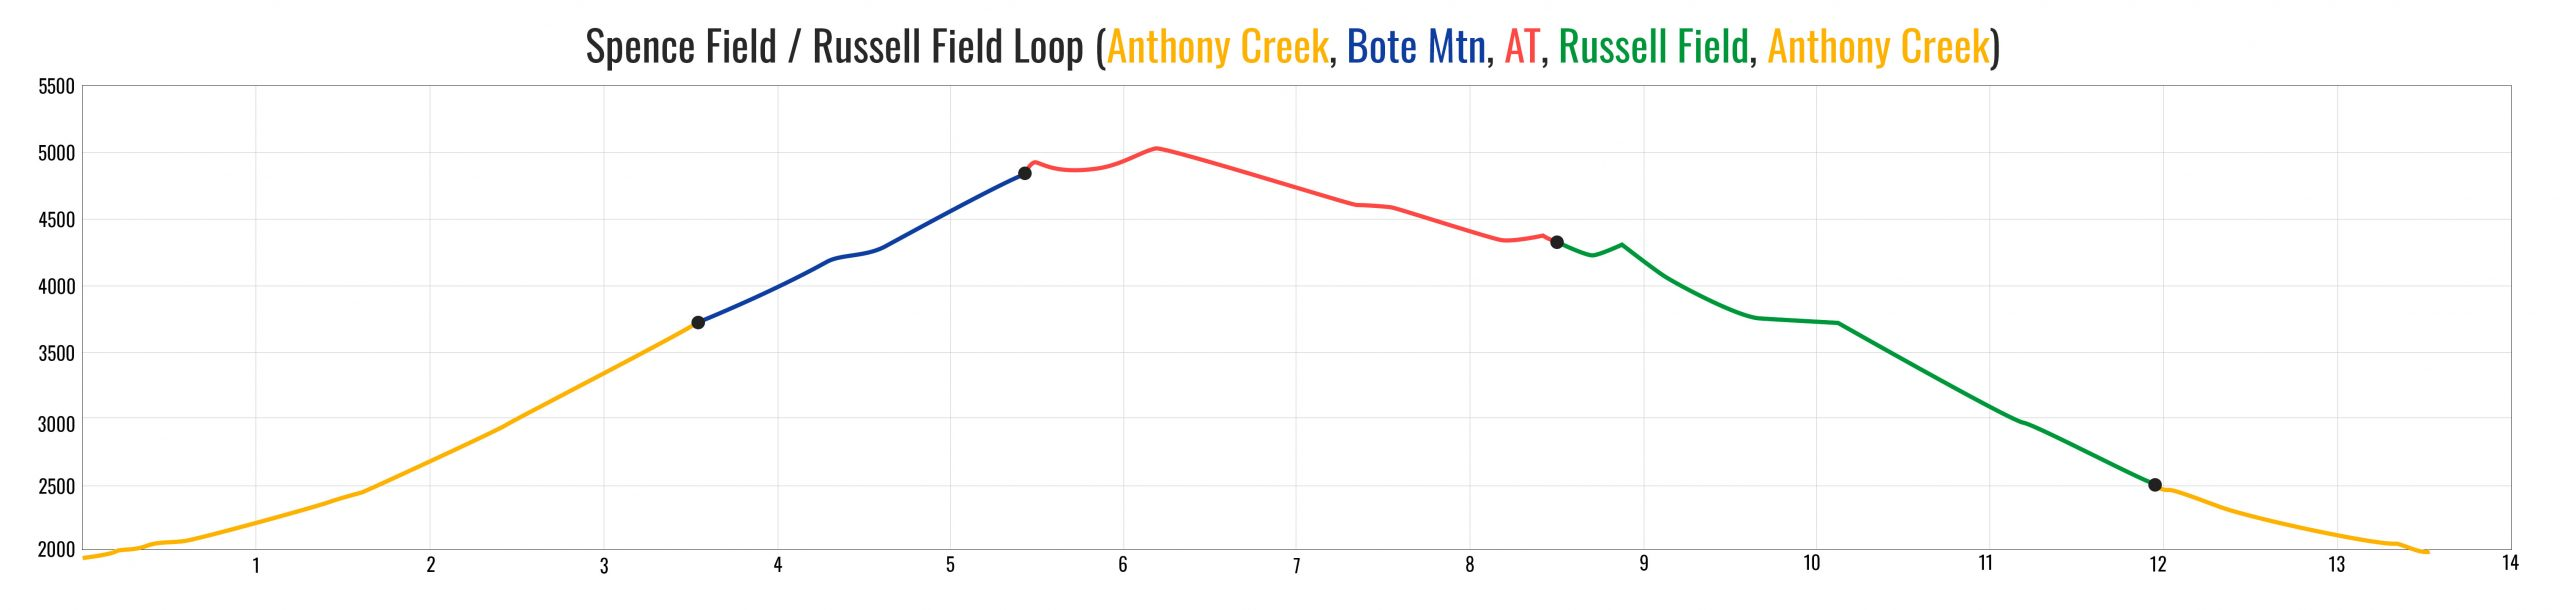 Spence / Russell Field Loop - Hiking elevation profile